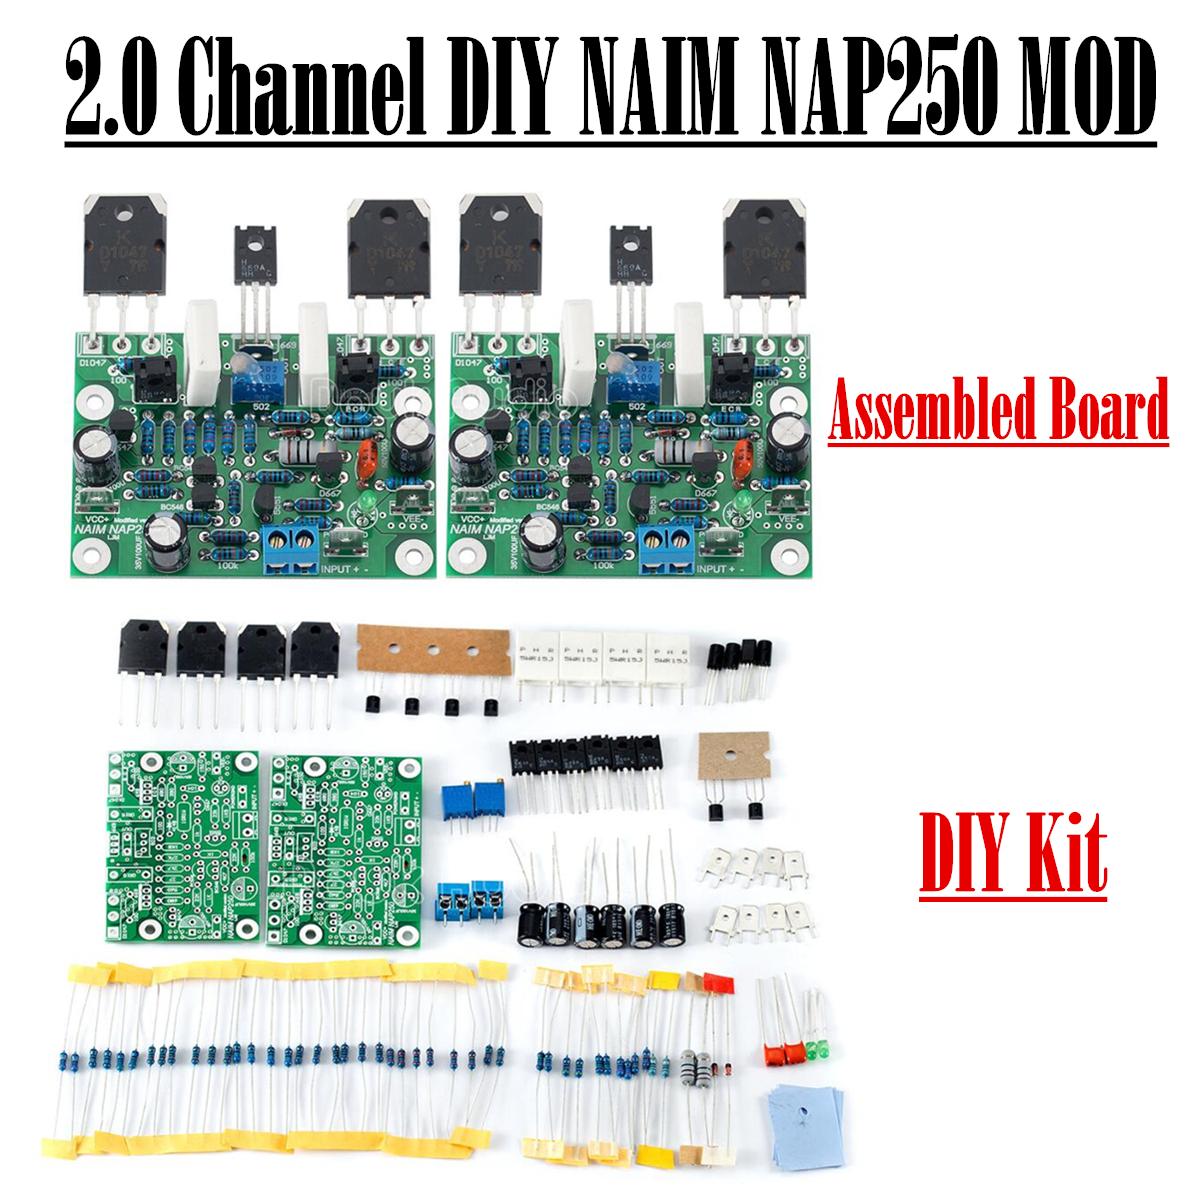 Douk Audio Naim Nap250 Mod 20 Channel Power Amplifier Diy Kit Amp Kits 2 Subwoofer Circuit Board For Stereo Mx50 Se Assembled